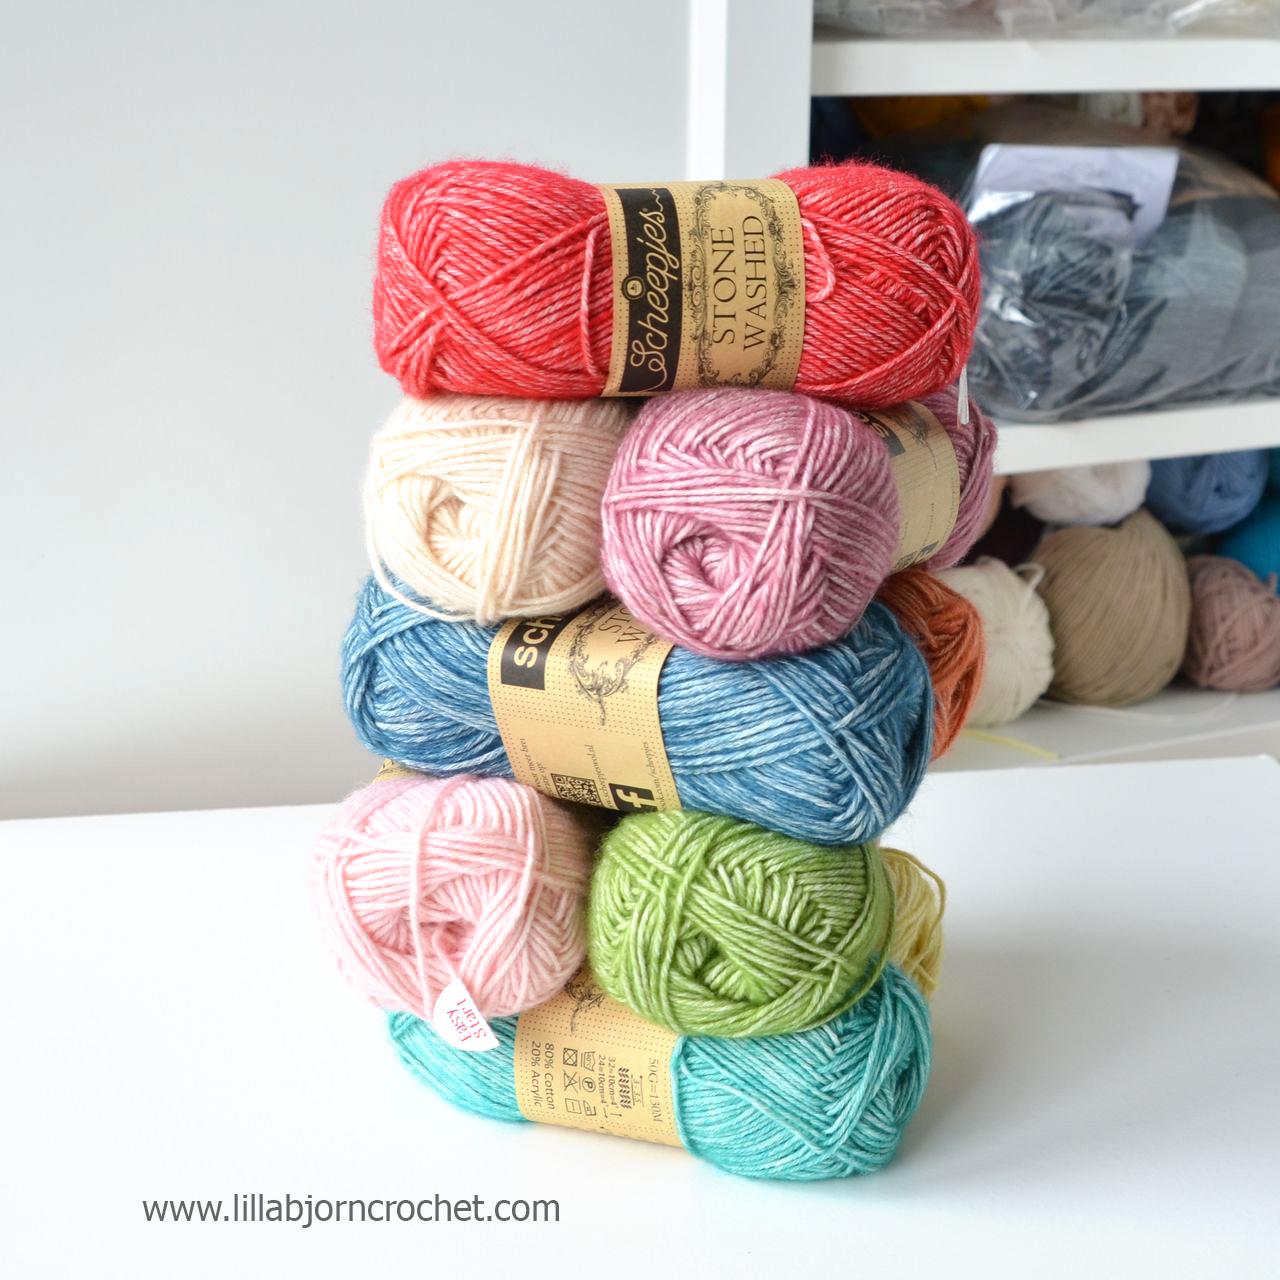 Stone Washed yarn by Scheepjes is my favourite